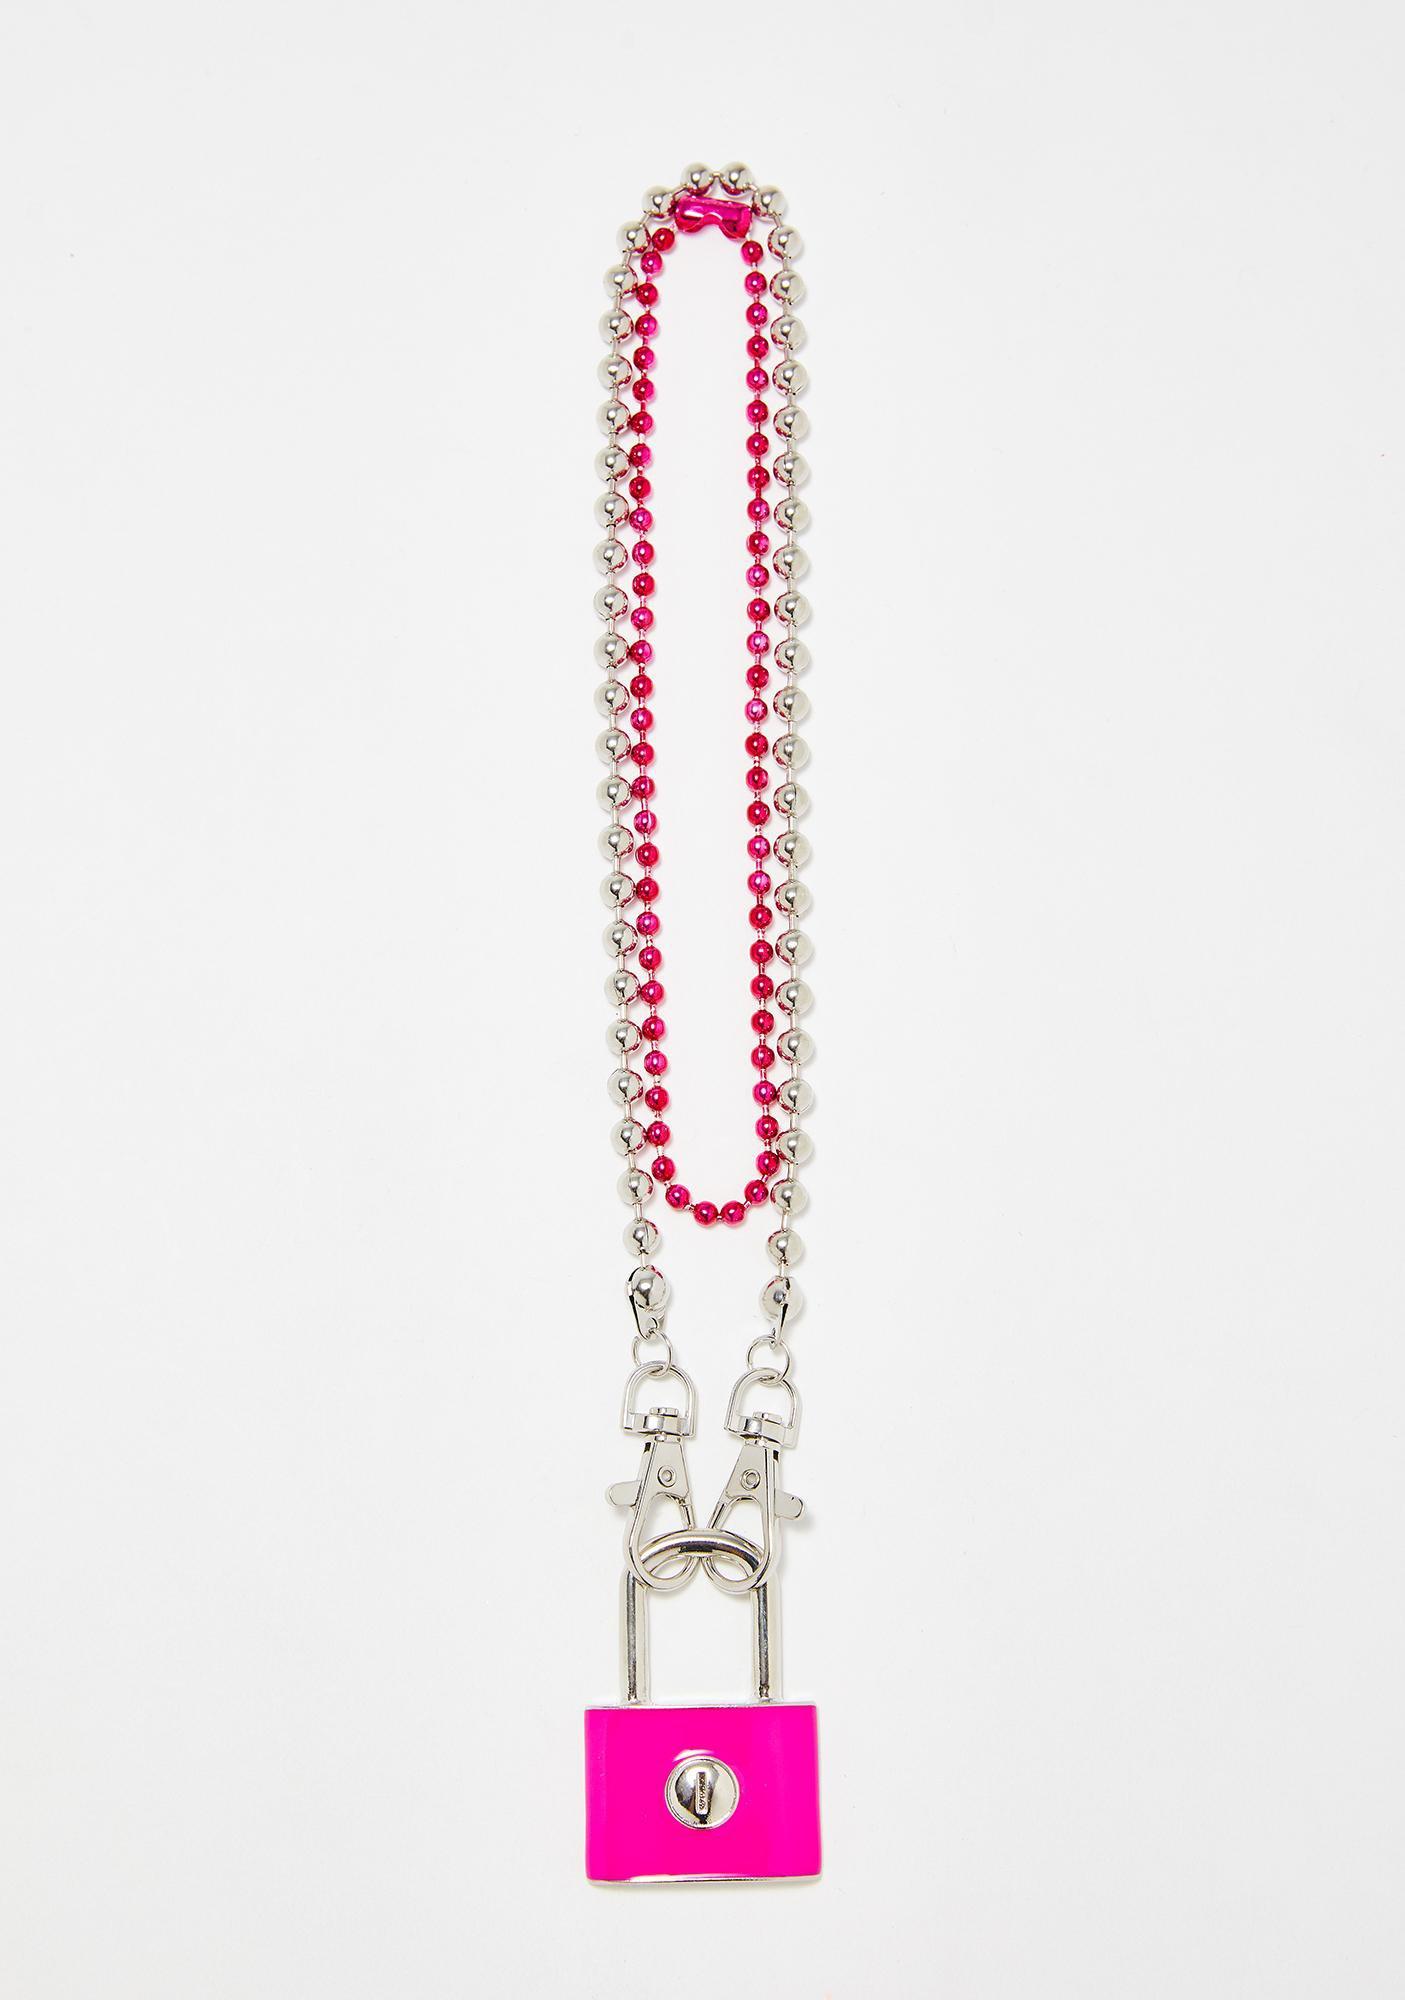 Ball Chain Layered Lock Necklace | Dolls Kill